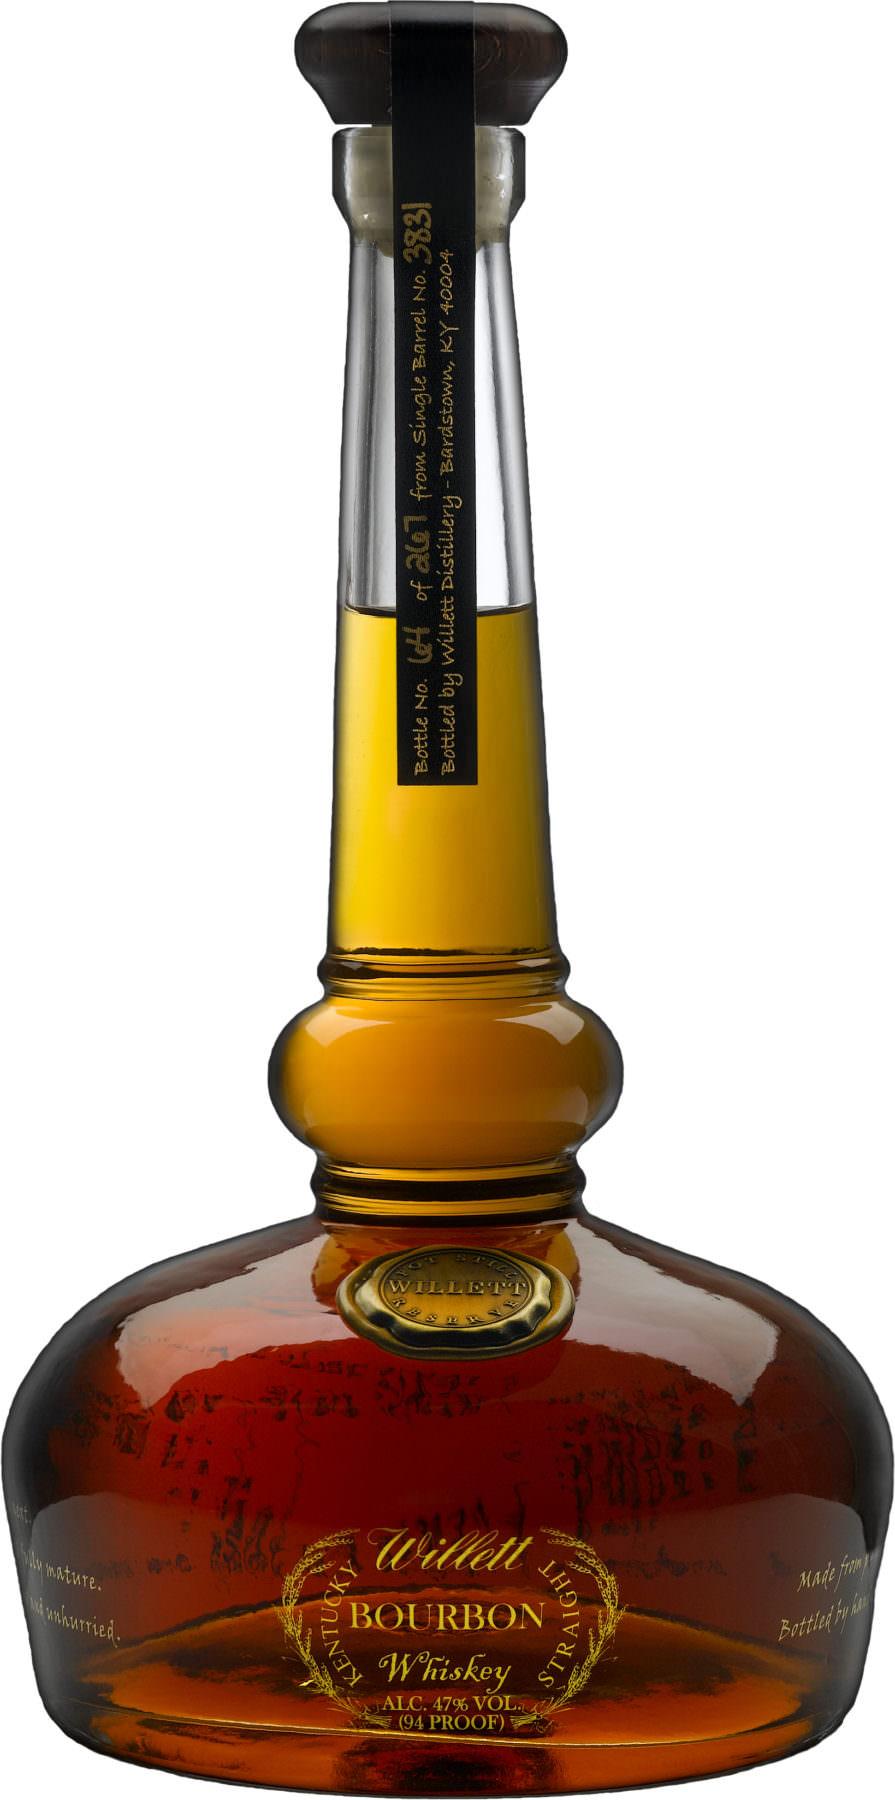 Willett bourbon - photo#7